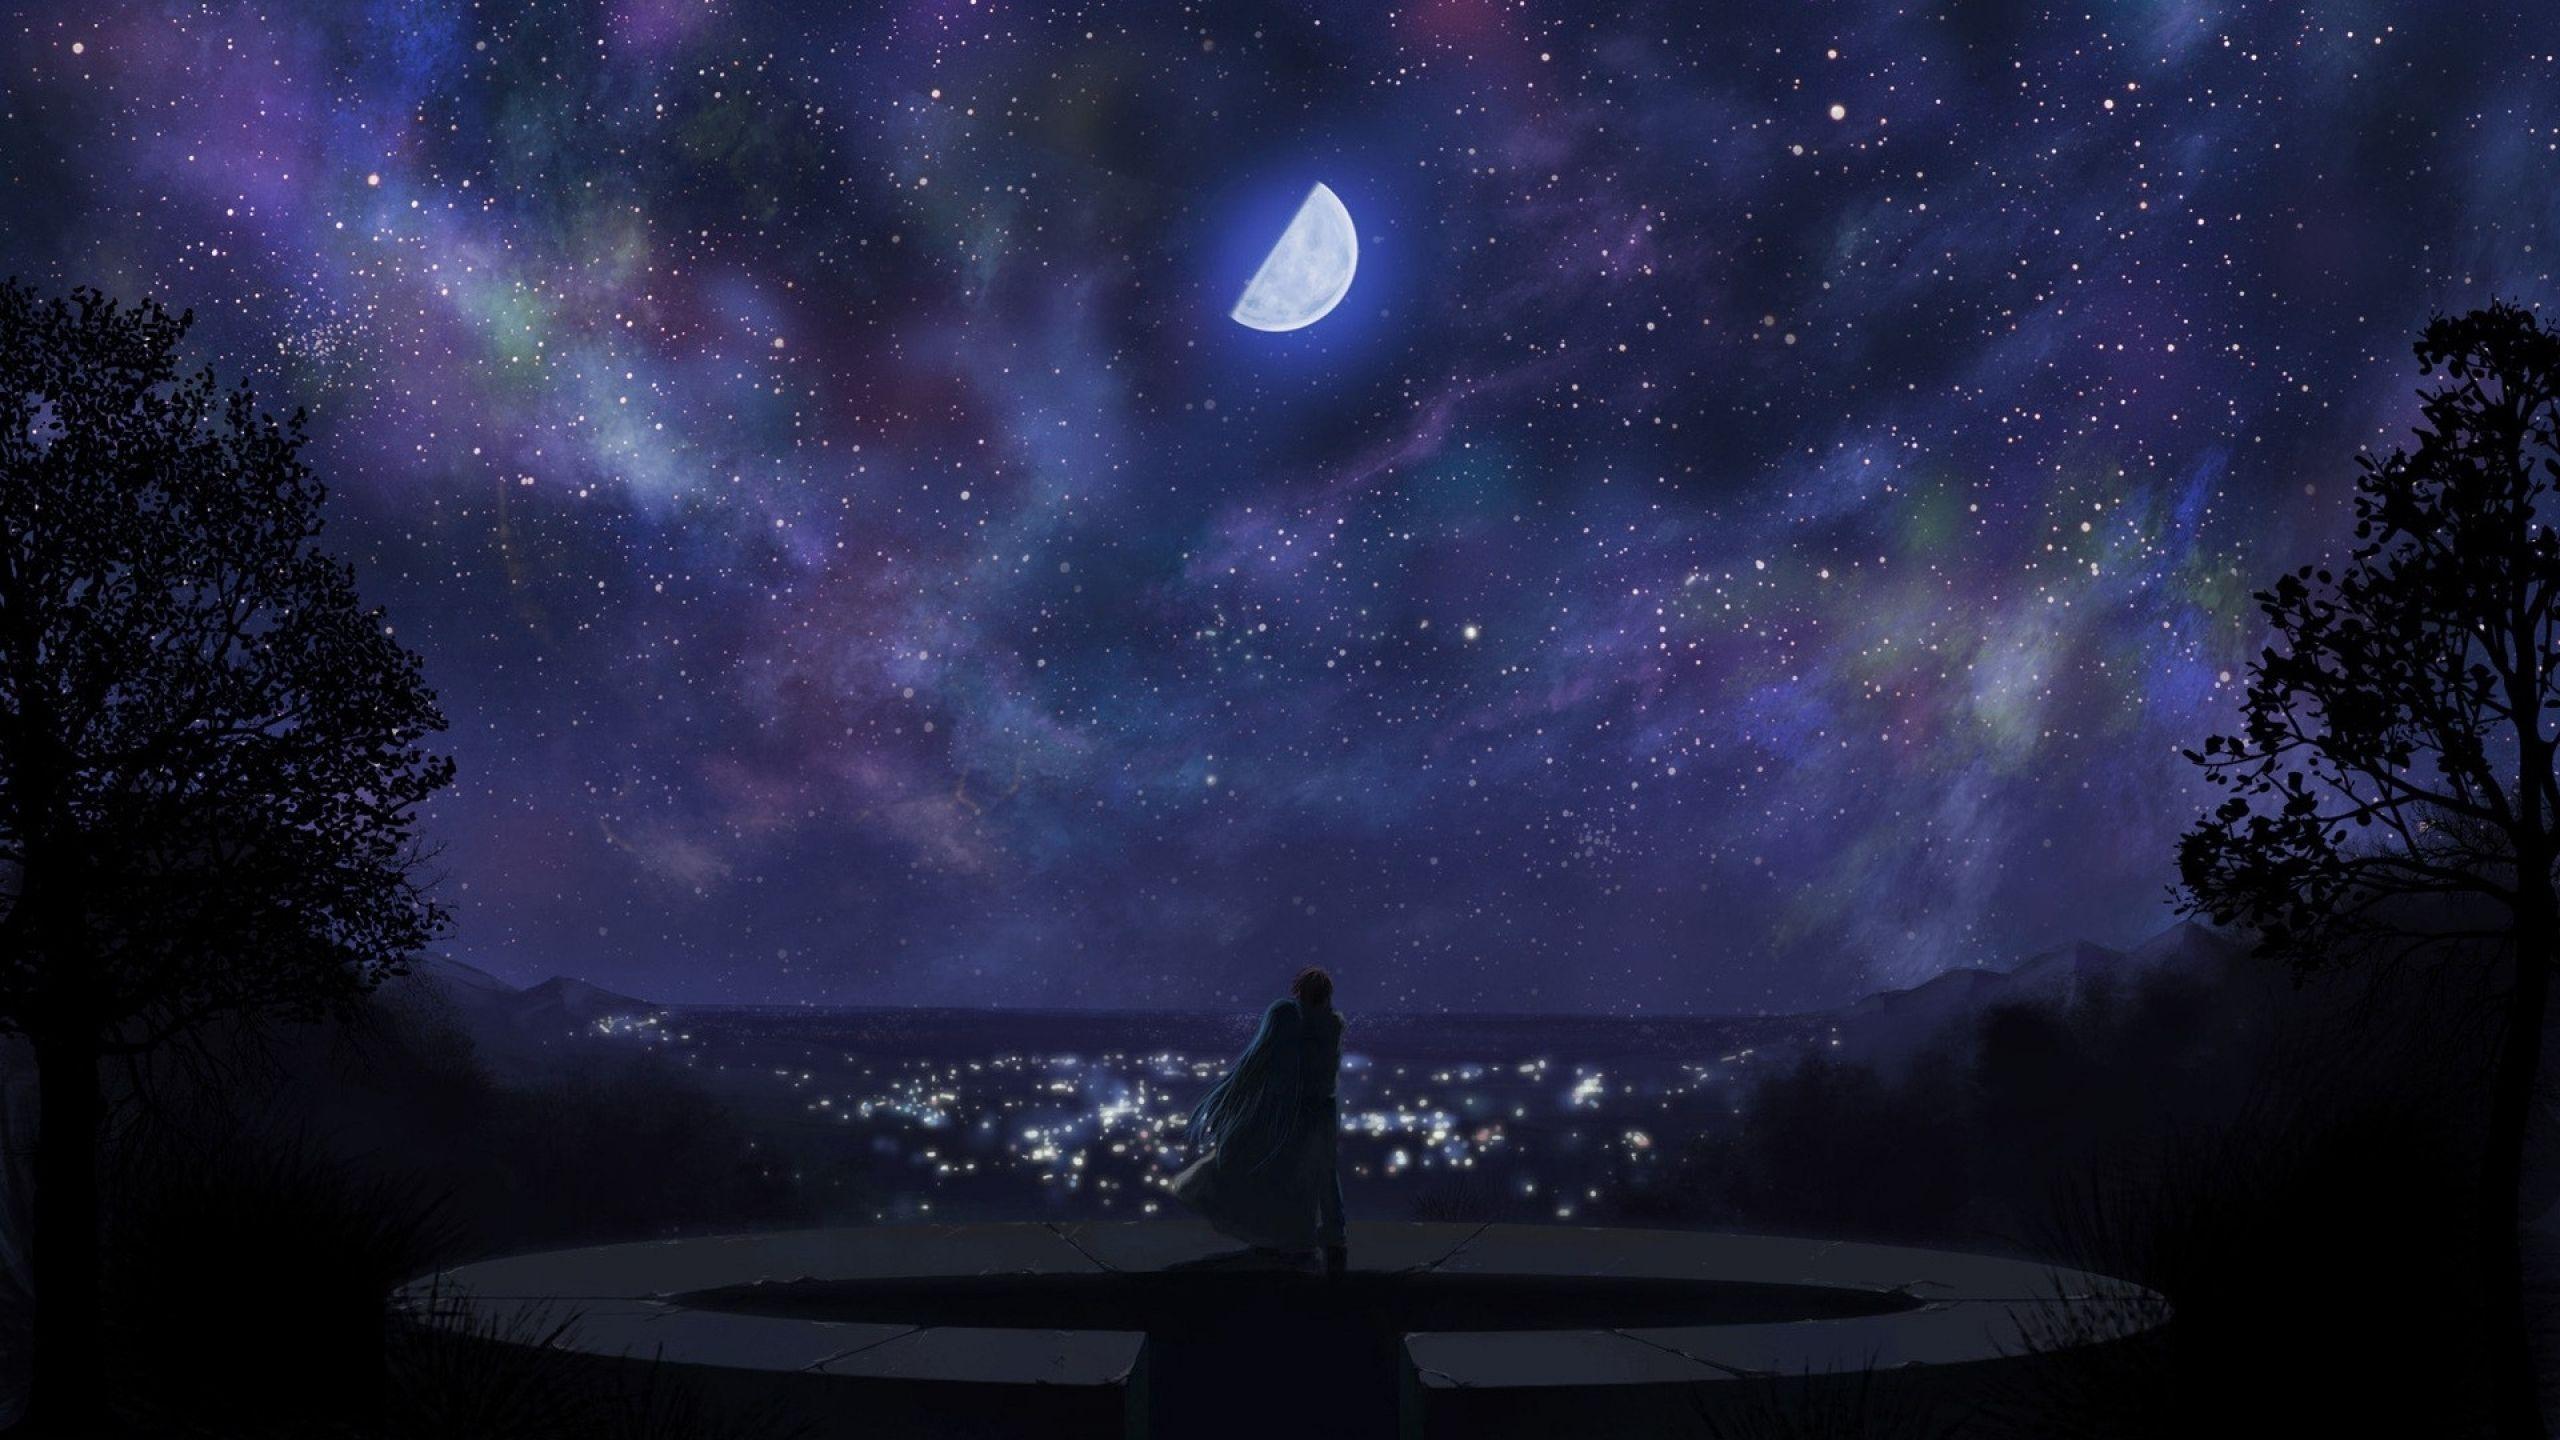 Anime Night Scenery Wallpapers - Top Free Anime Night